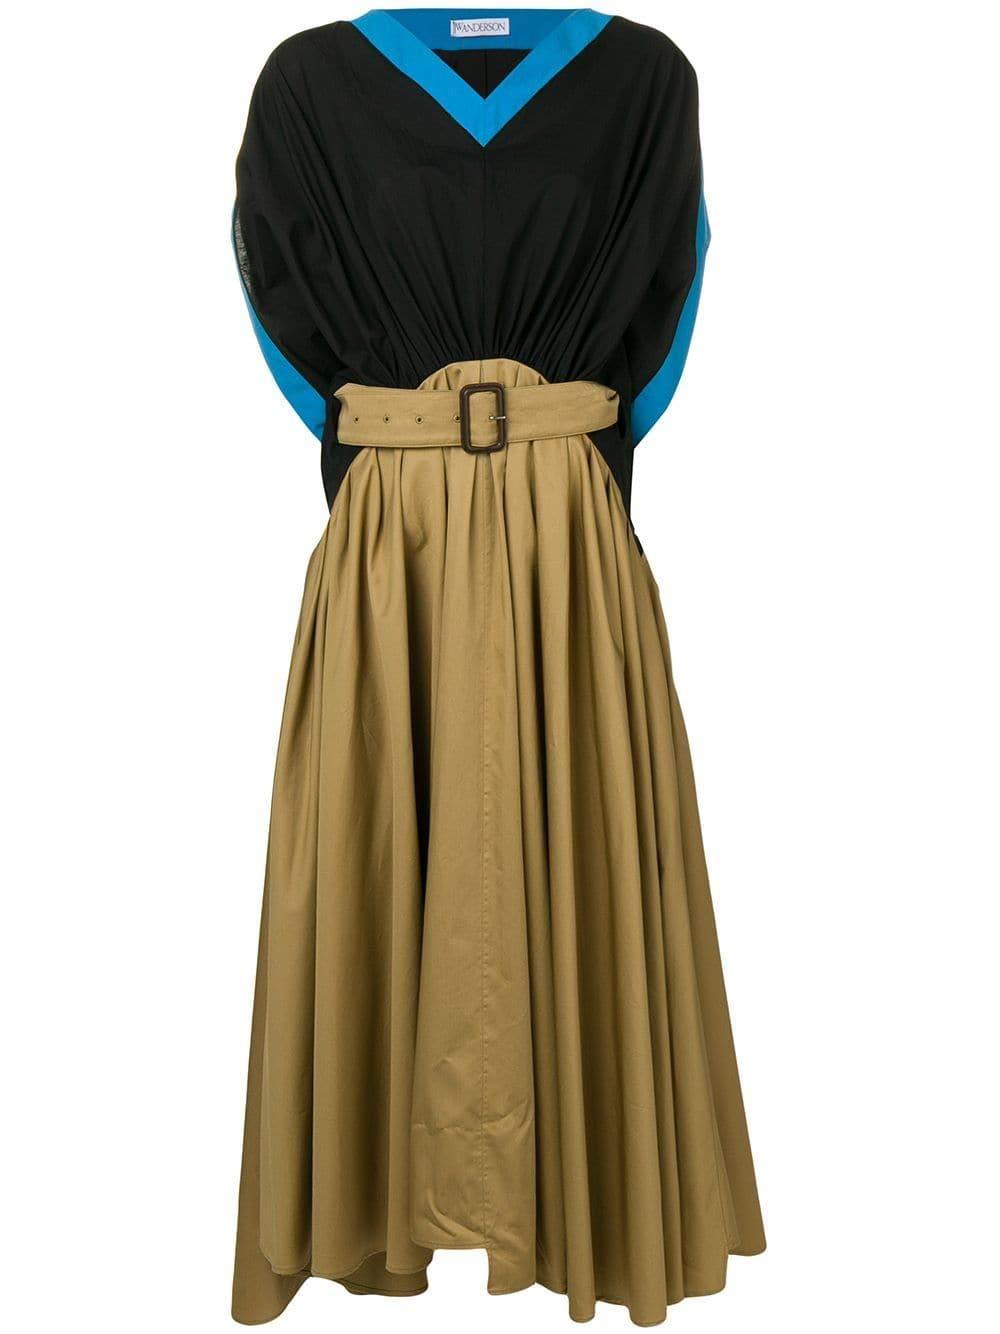 J.W. Anderson Women's DR07719A166165 Green Cotton Dress